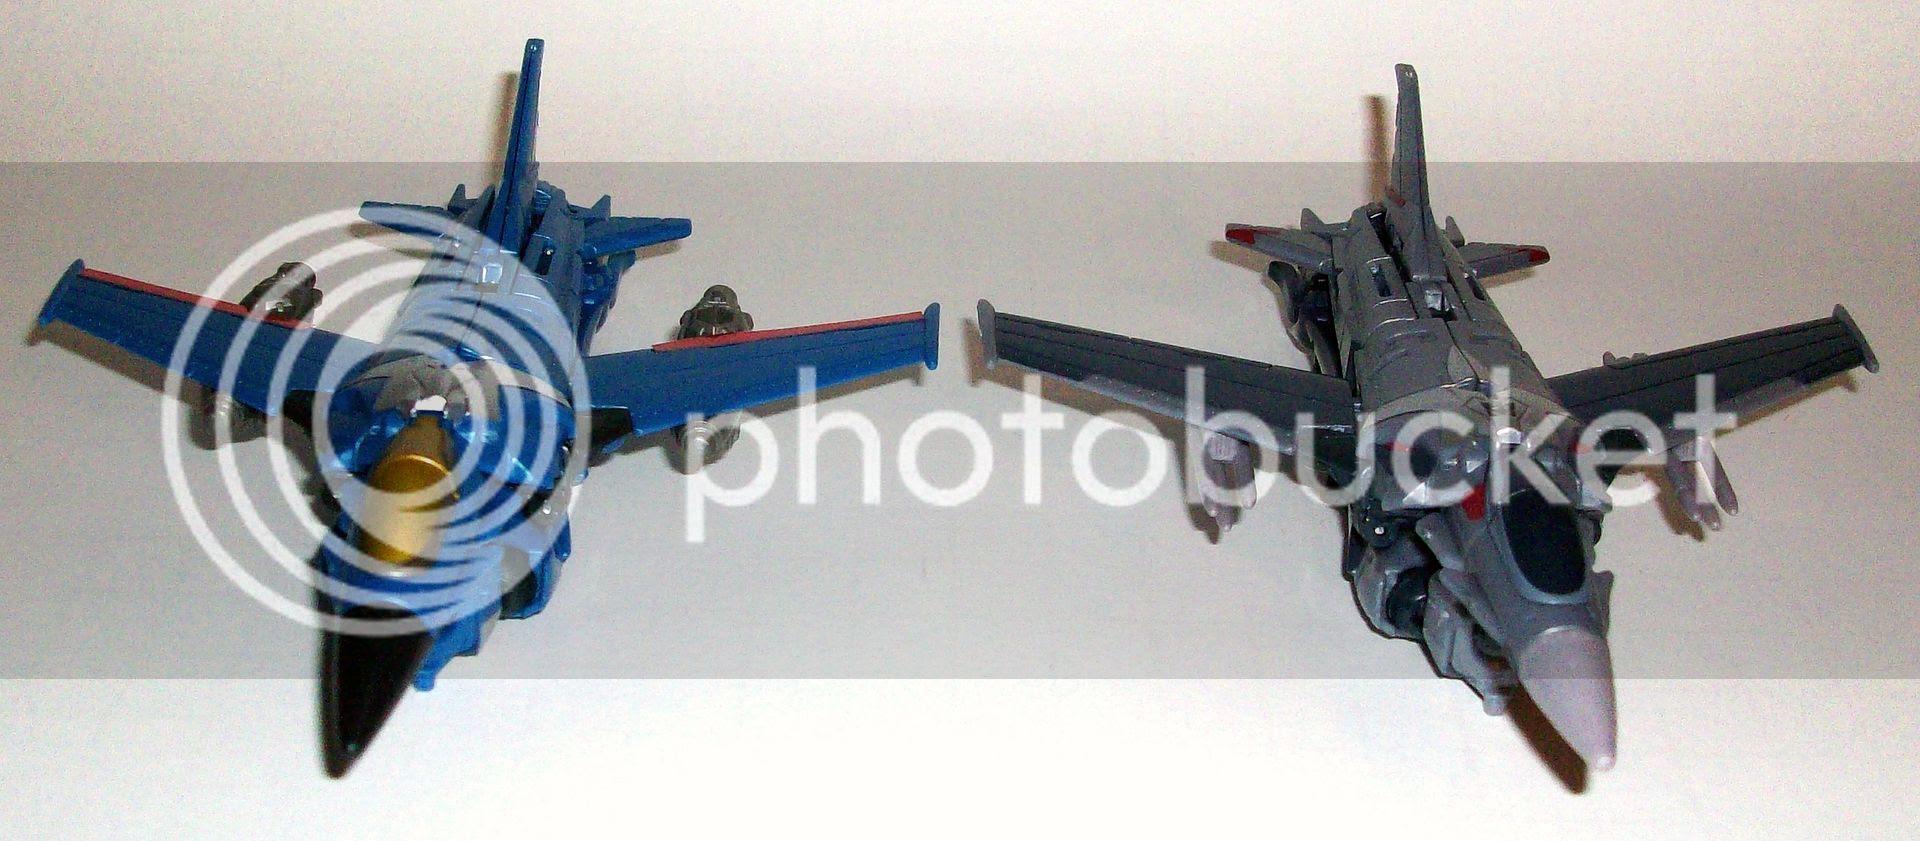 Arms Micron Thundercracker photo 024_zpsa71338ed.jpg